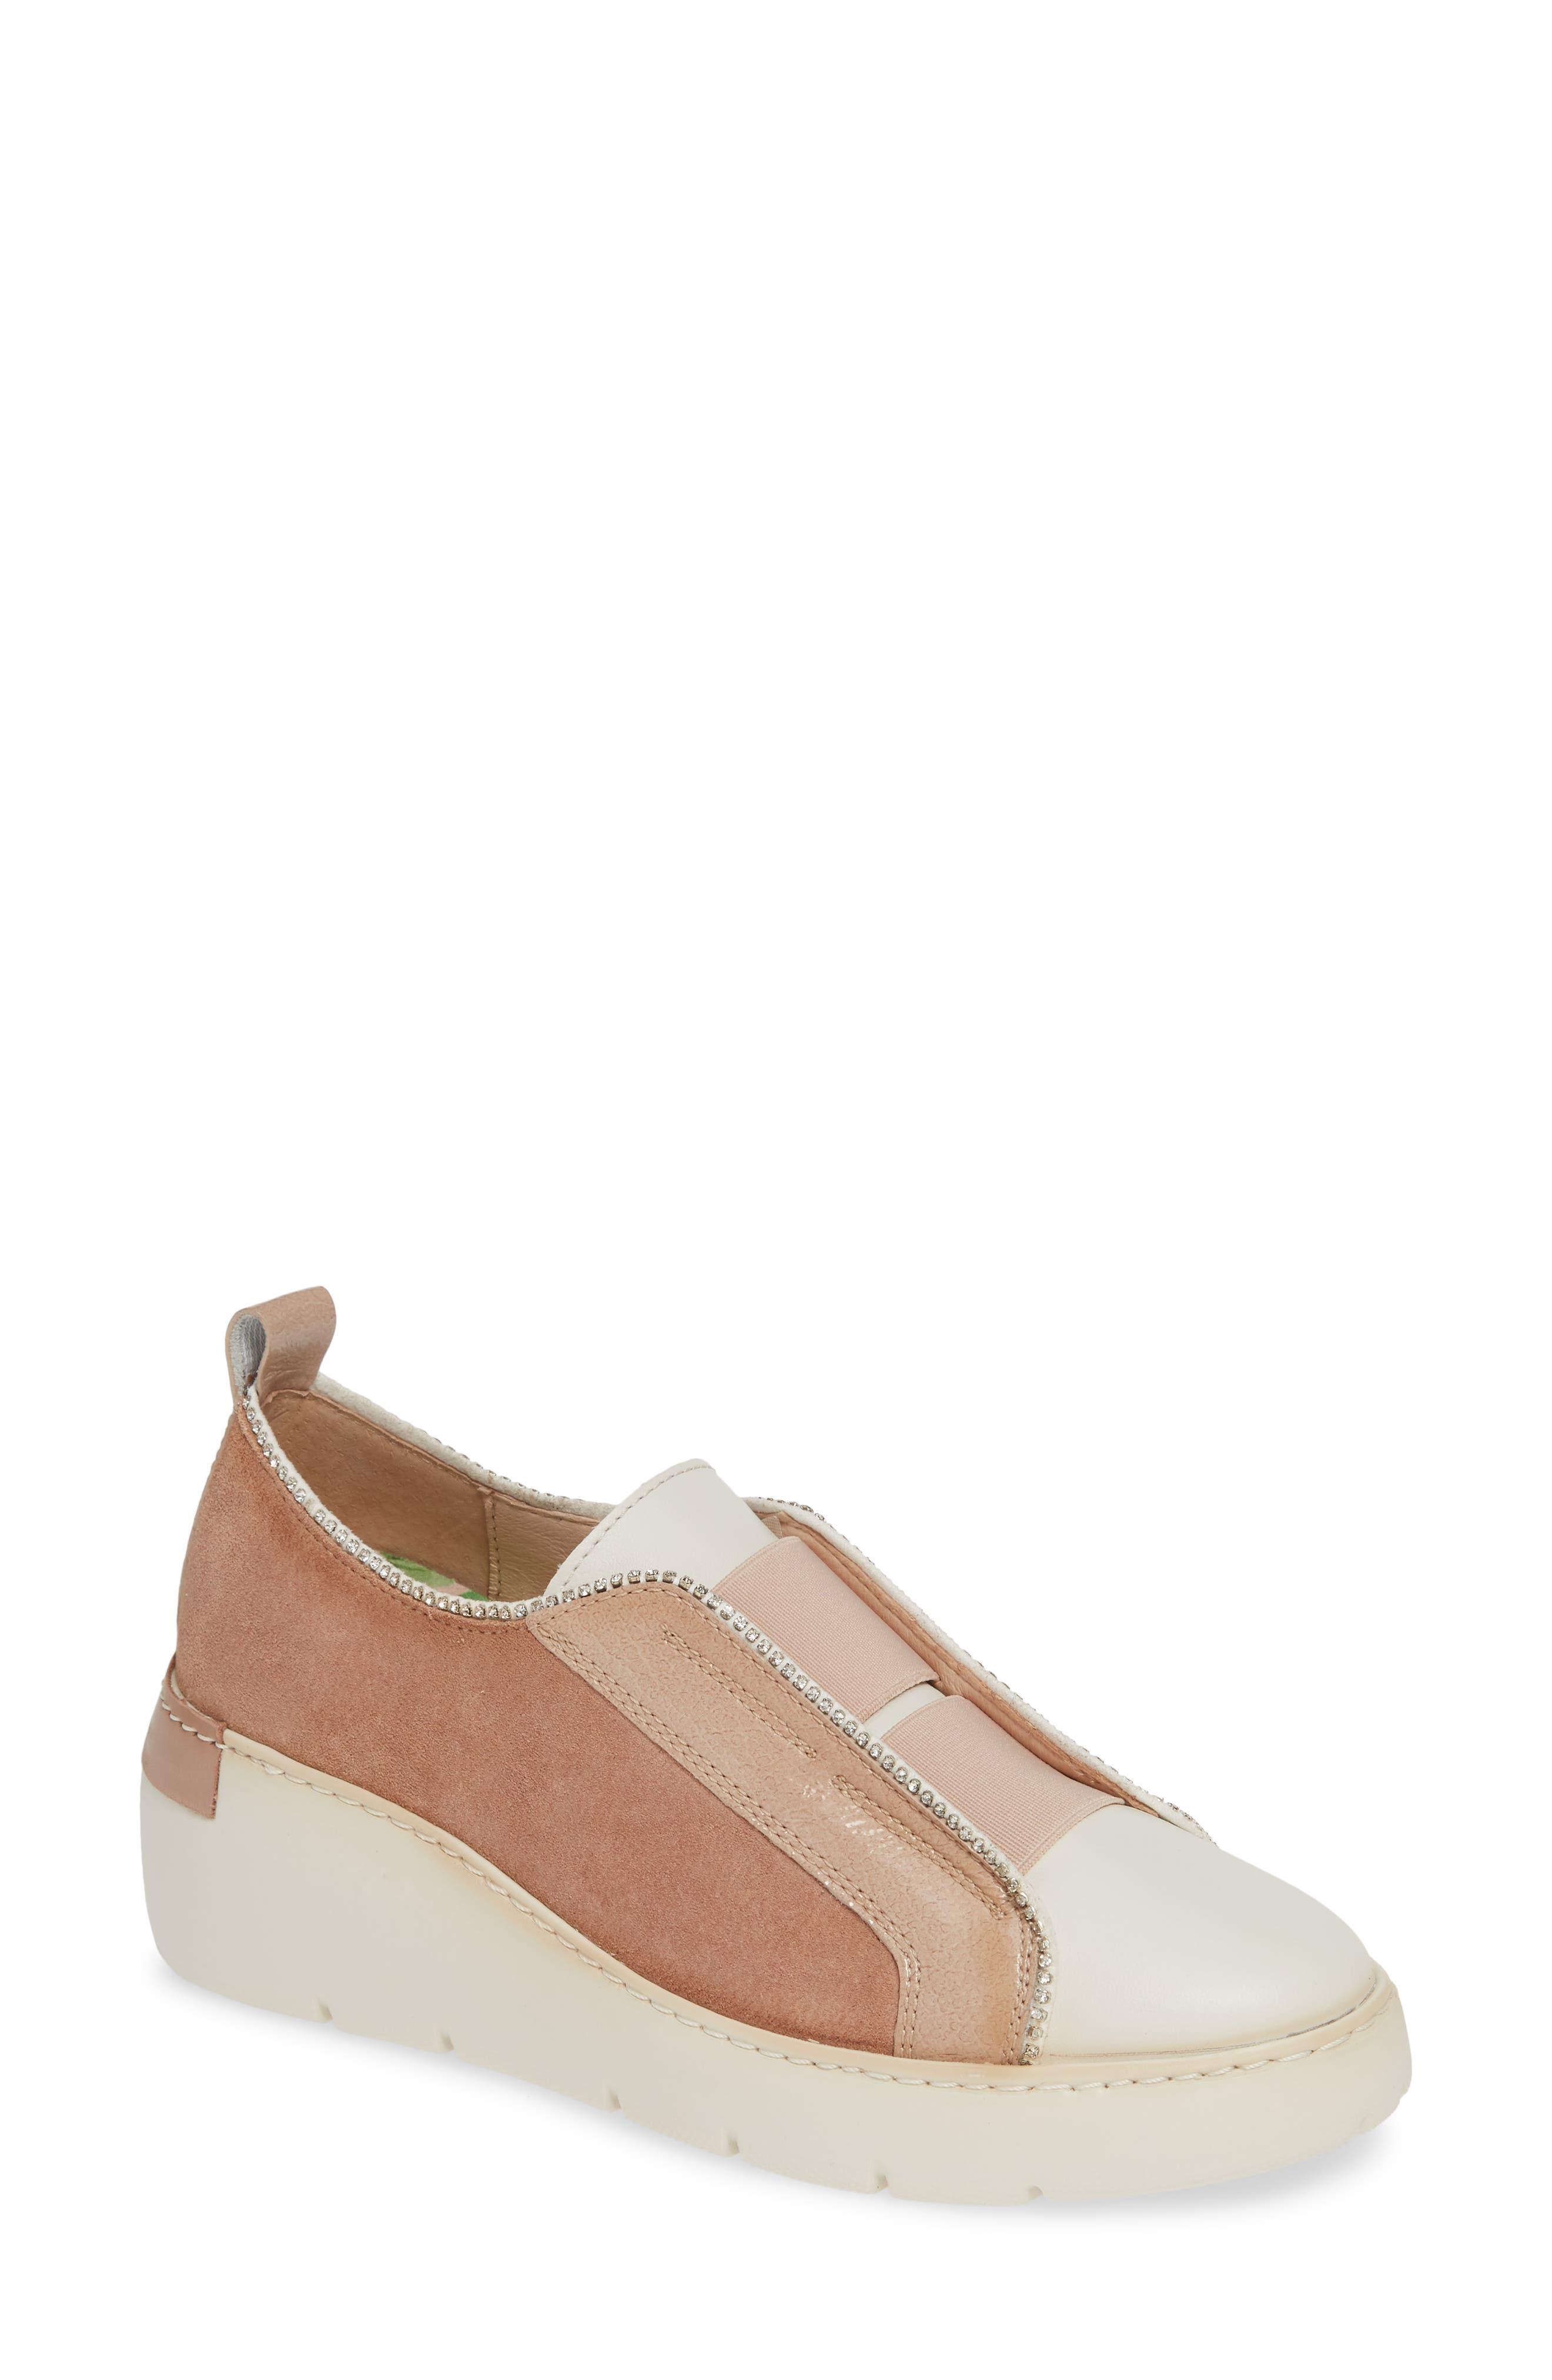 HISPANITAS, Benton Slip-On Wedge Sneaker, Main thumbnail 1, color, VELOUR FLESH LEATHER